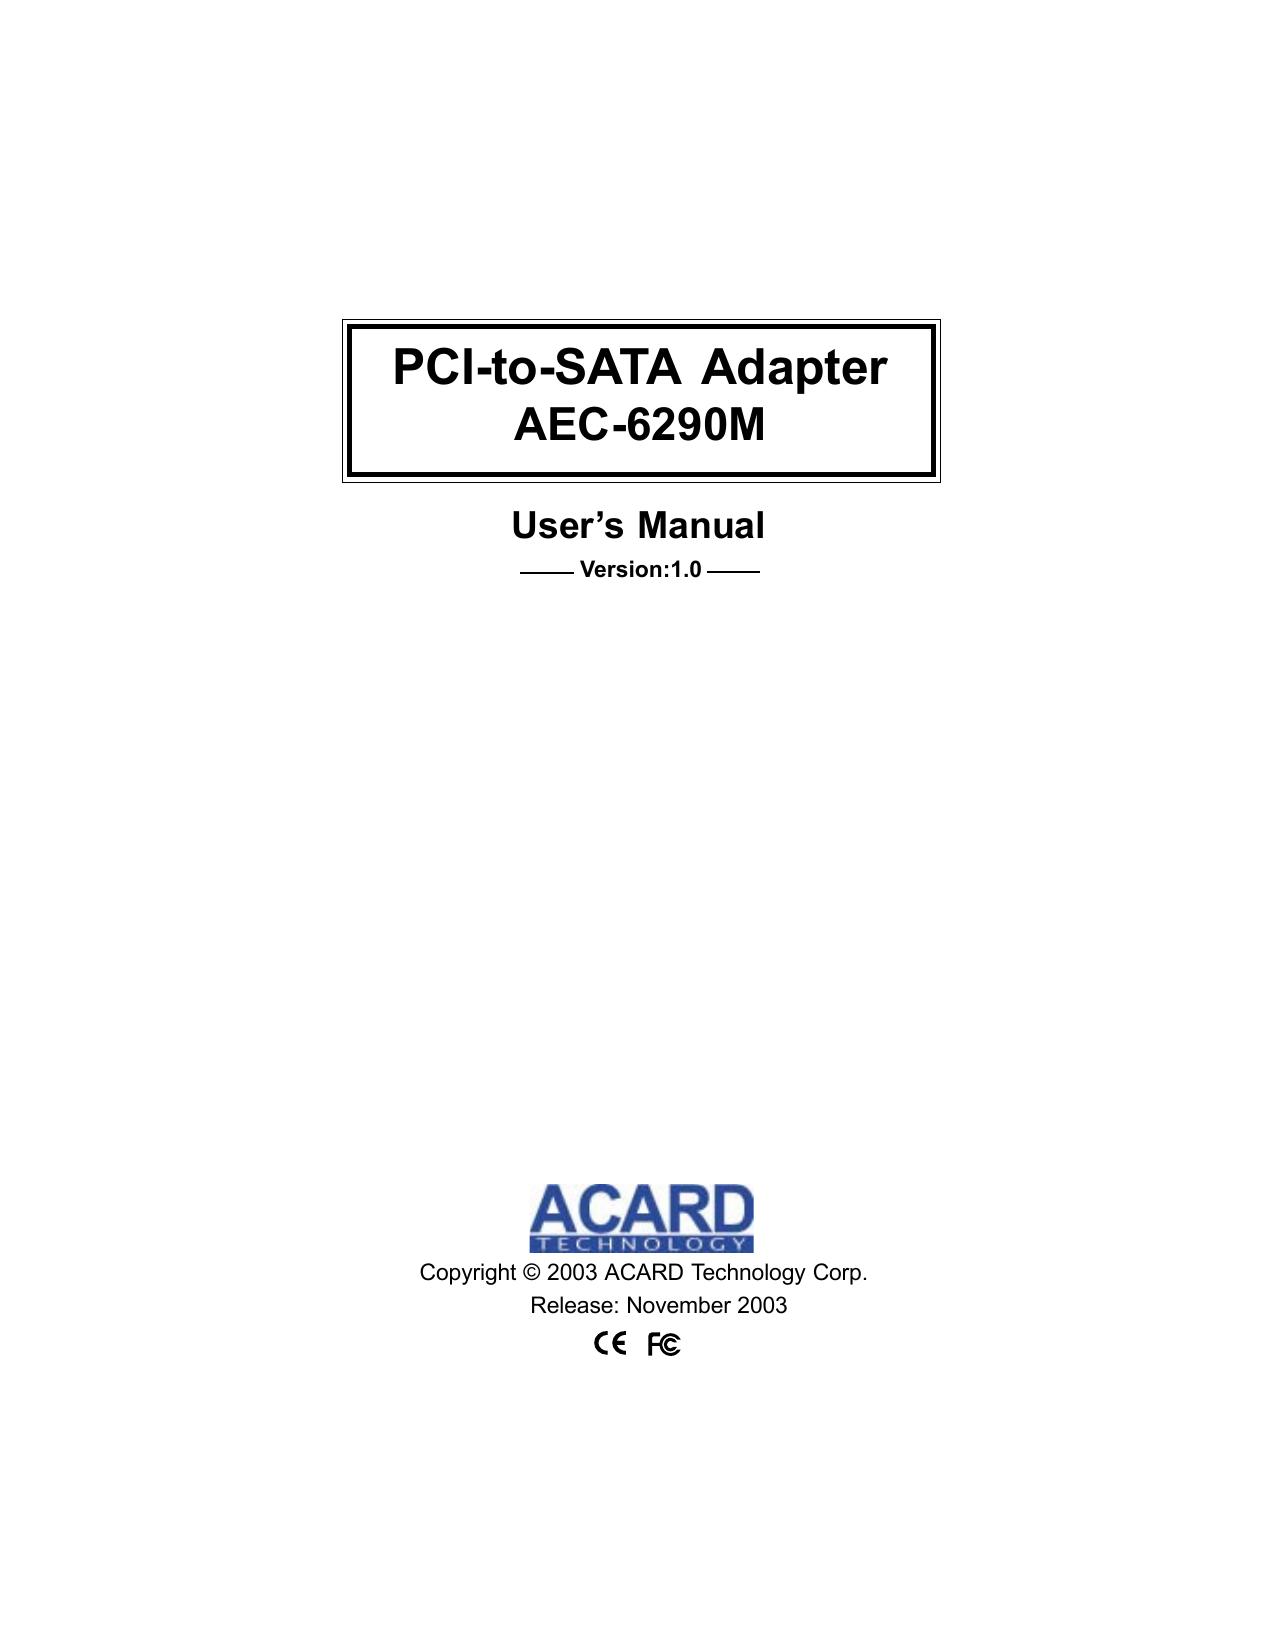 ACARD BIOS AEC-6290M DRIVER FOR PC